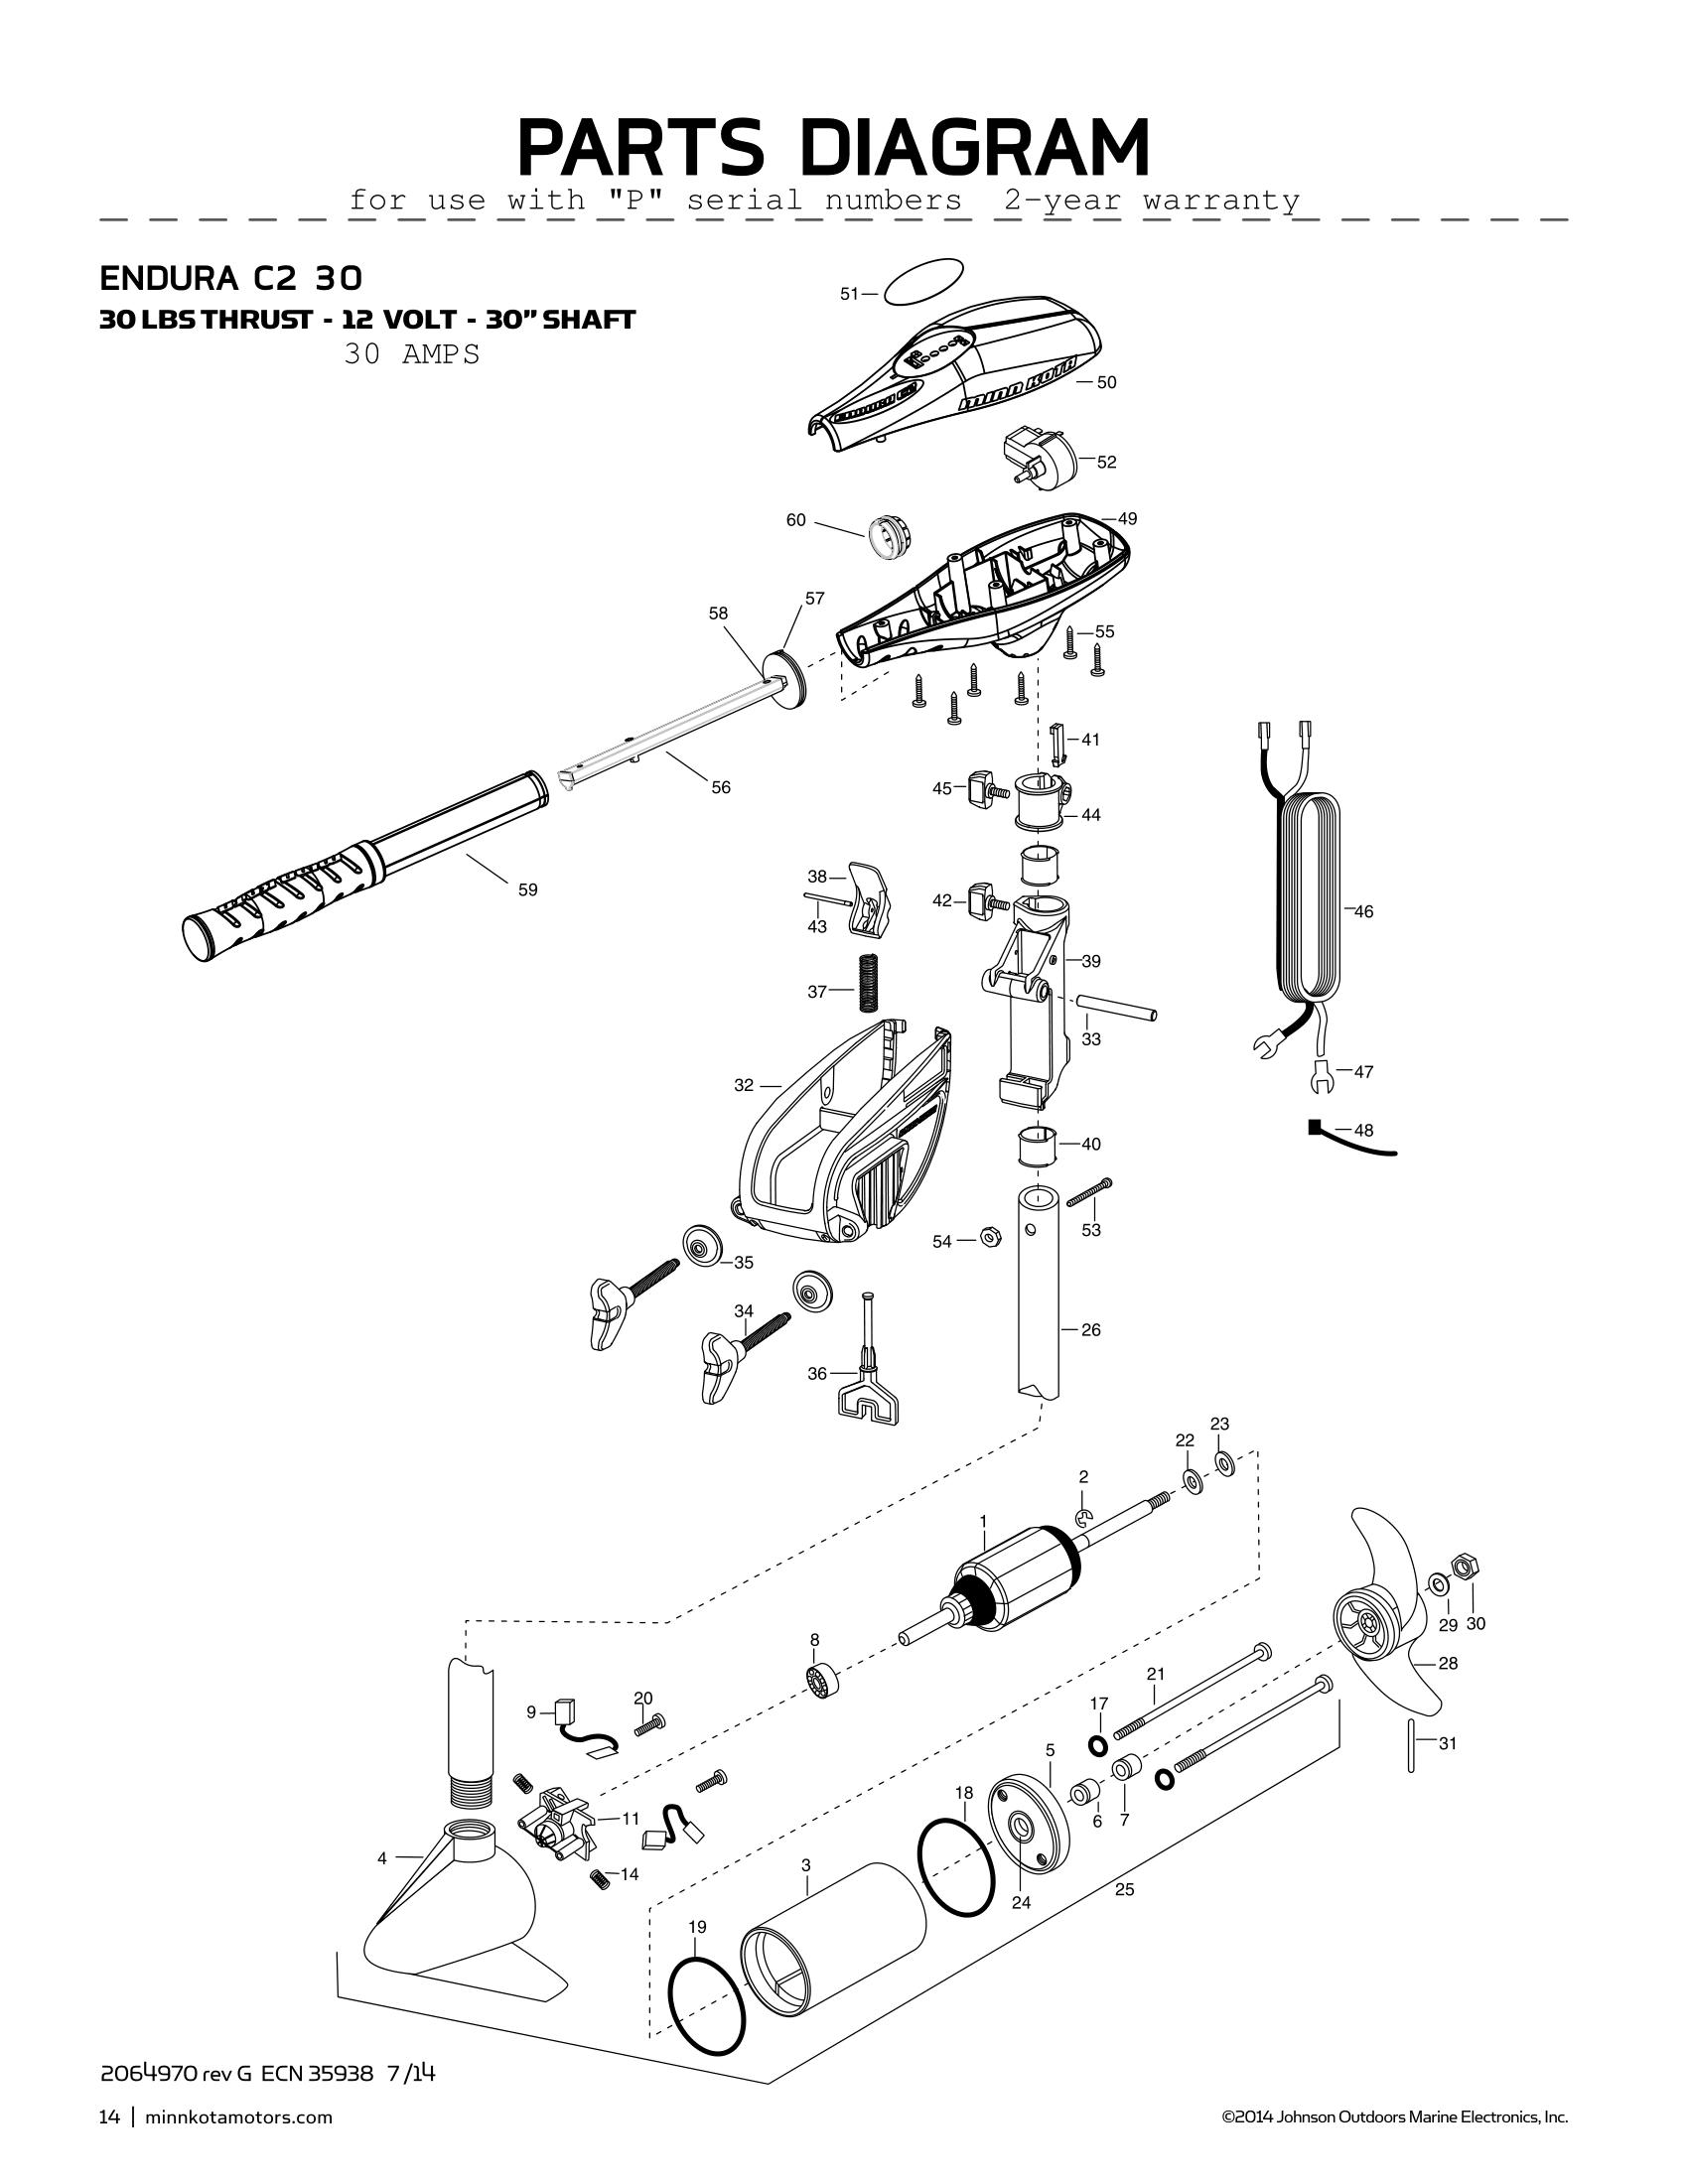 Minn Kota Trolling Motor Schematics - Wiring Diagram & Cable ... Circuit Breaker For Trolling Motor Wiring Diagram on